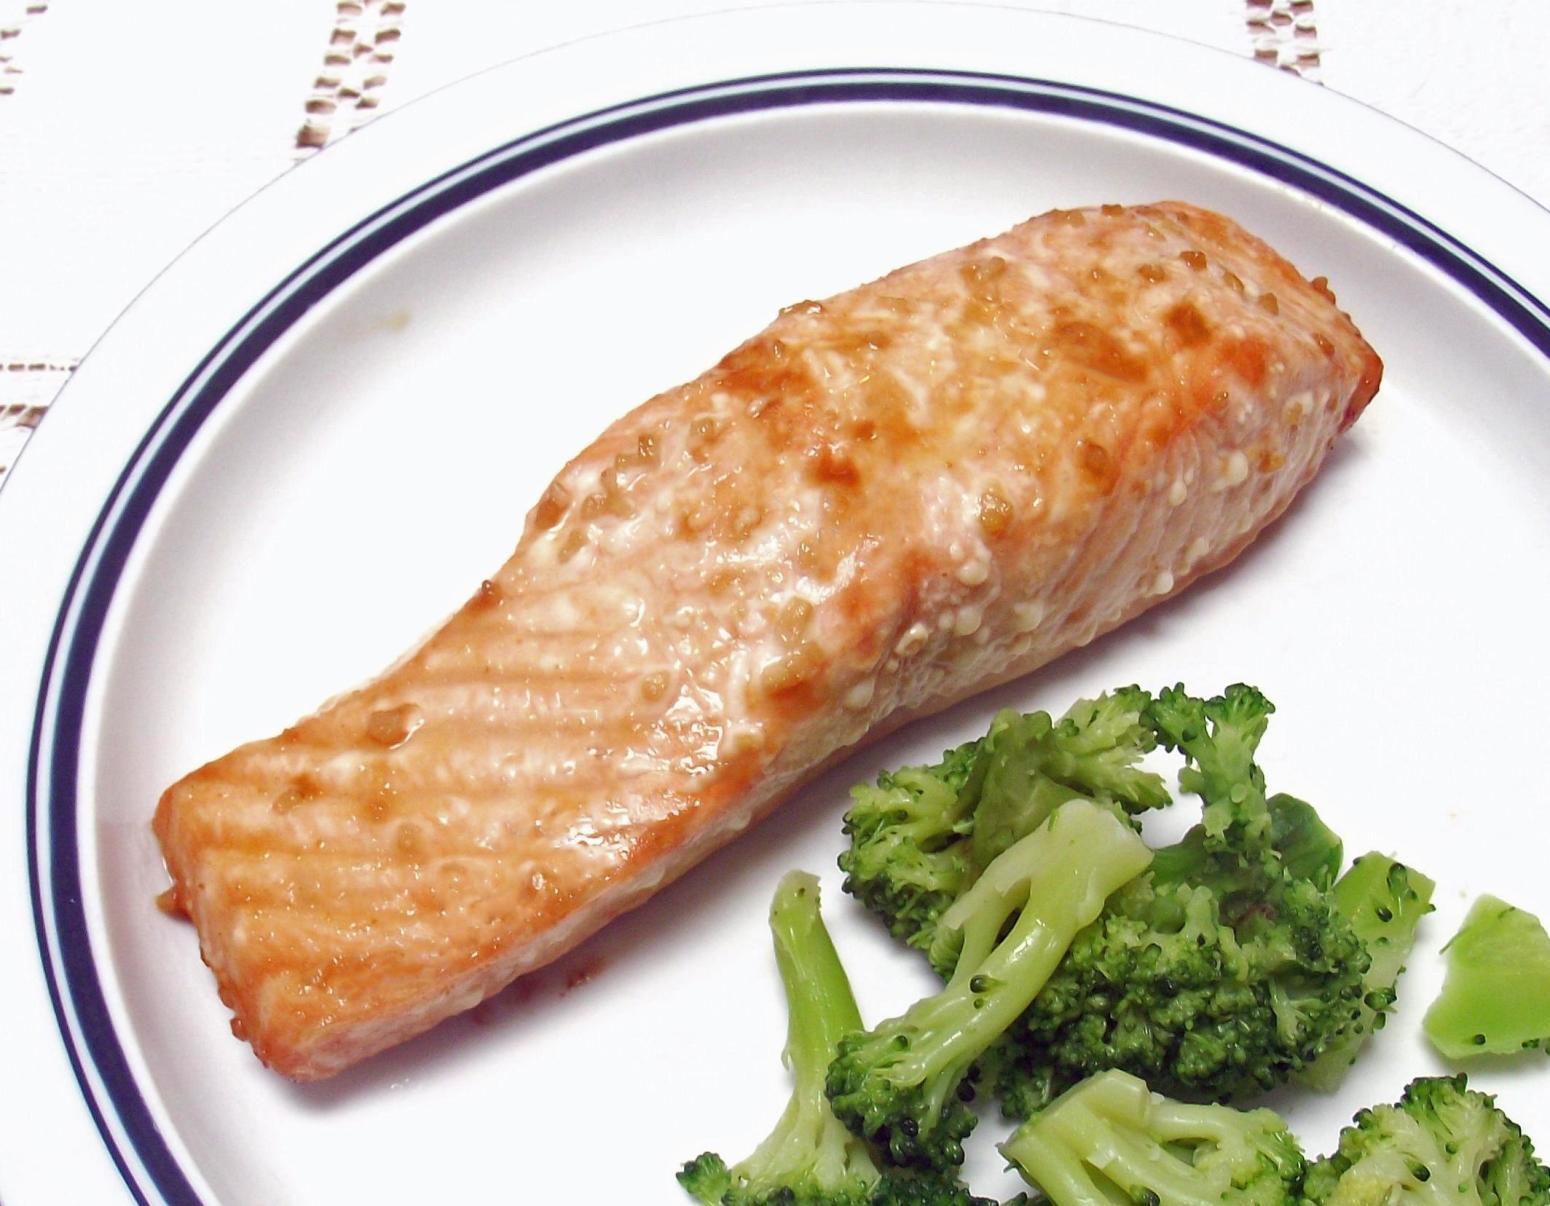 Orange Teriyaki Salmon Recipe | Just A Pinch Recipes